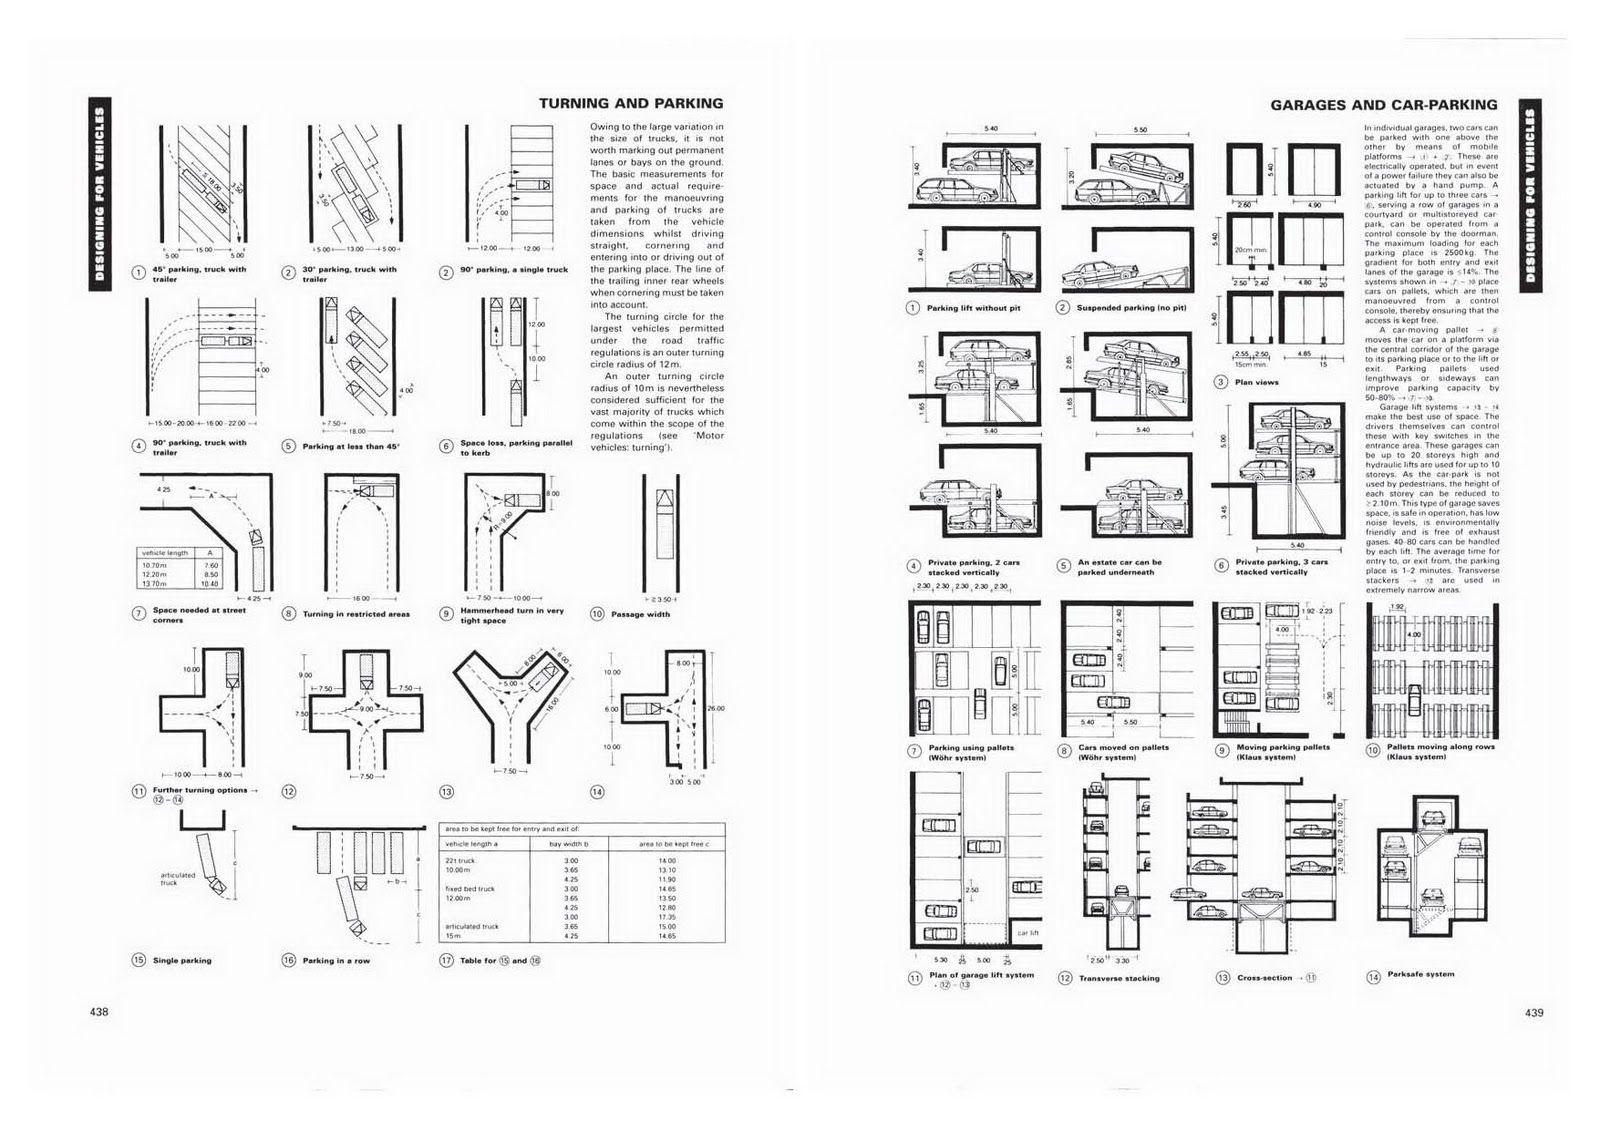 Parking Garage Design Standards Hcsdesign Parking Design